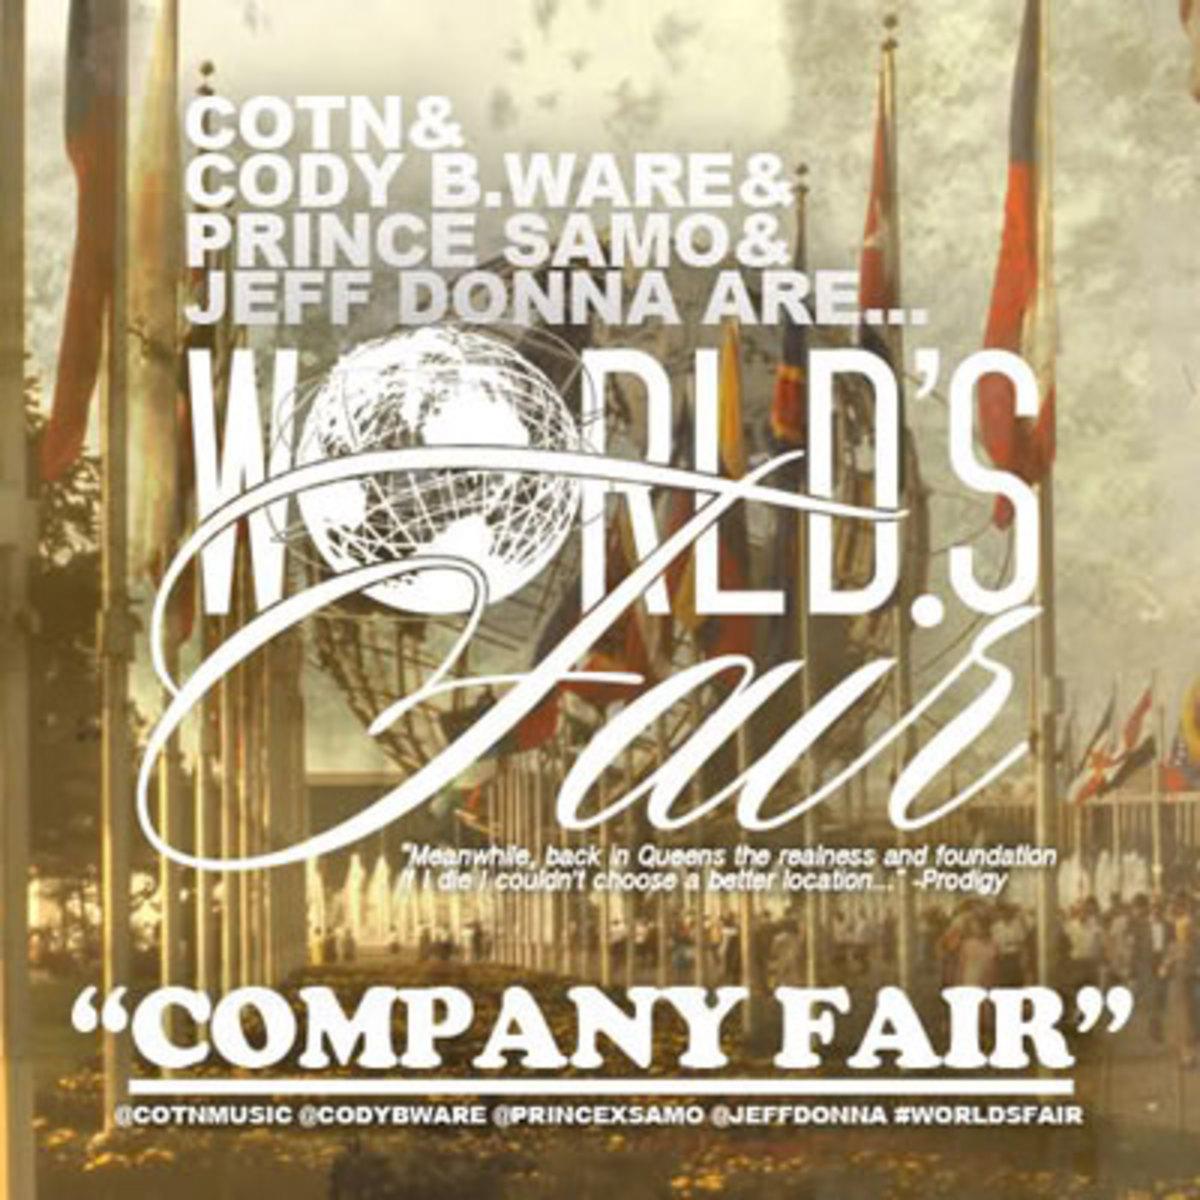 worldsfair-companyfair.jpg